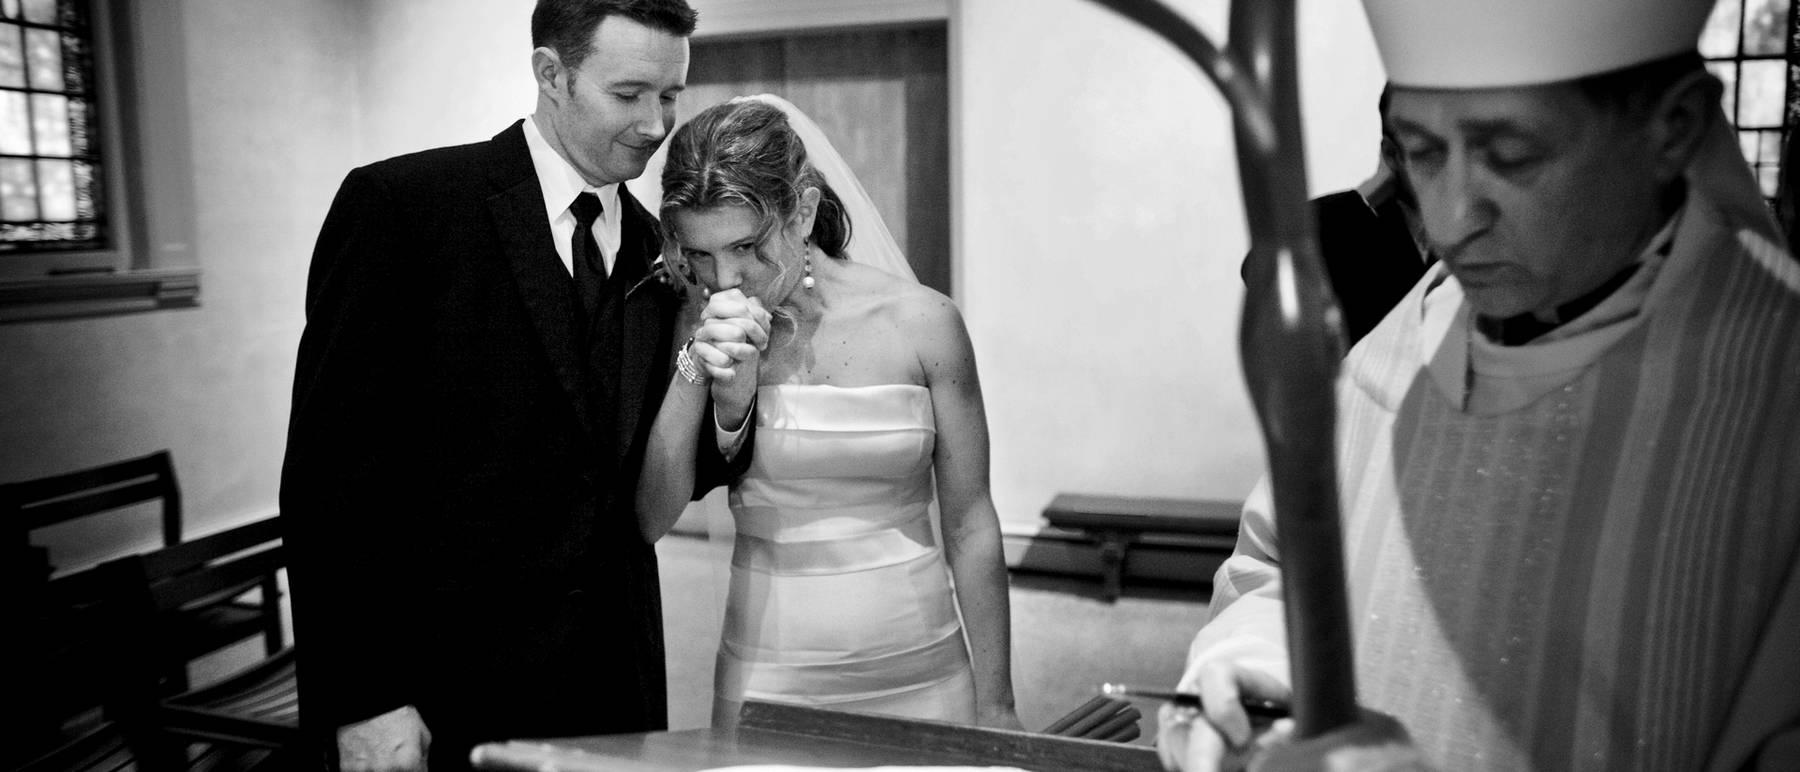 johnandjoseph-wedding-photographer-hz-slider-318